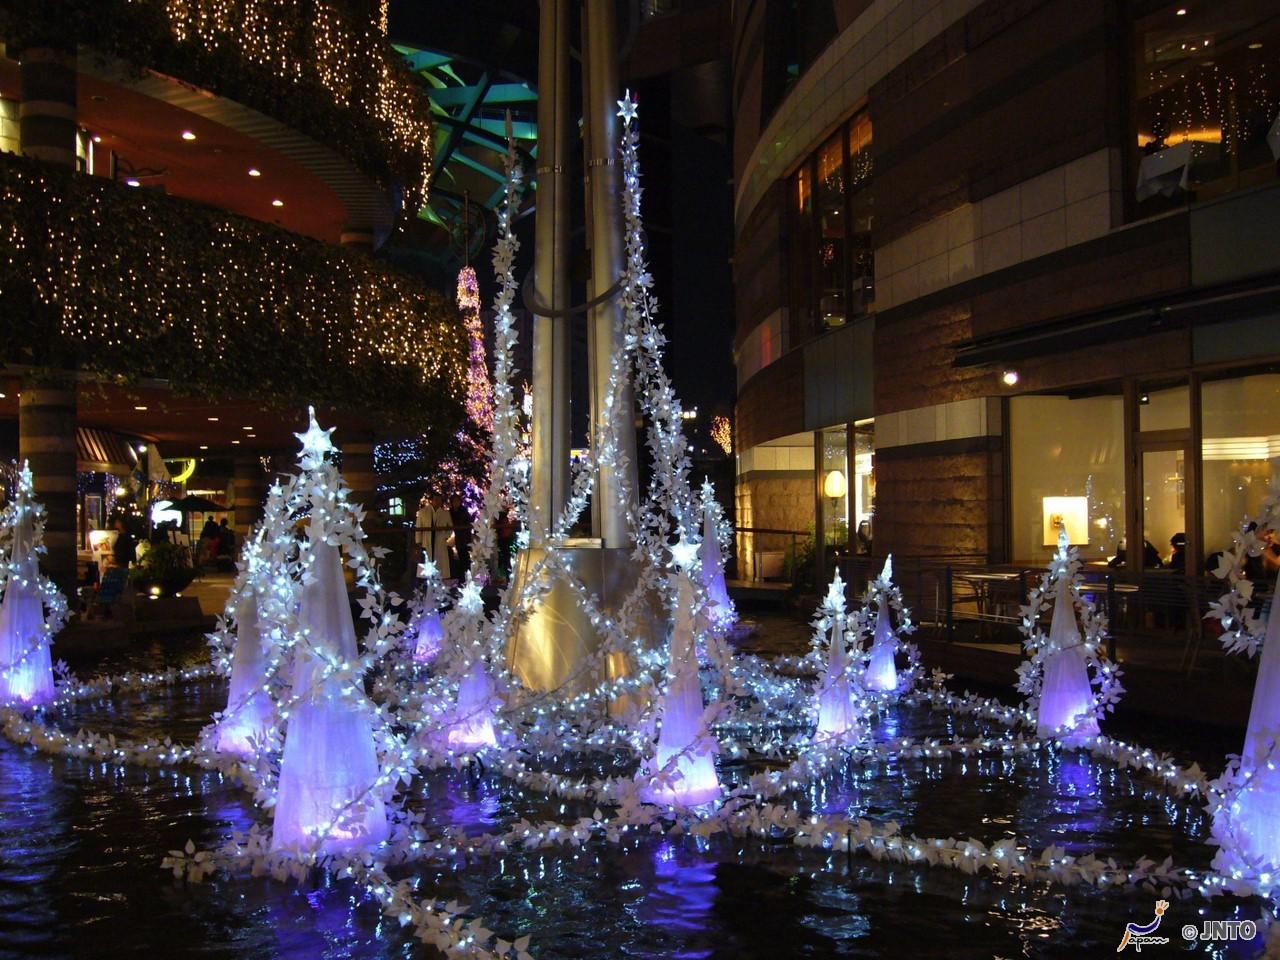 4D3N.Fukuoka. Toyoko Inn in Fukuoka. Free & Easy **ALPHA MAGIC 9.0